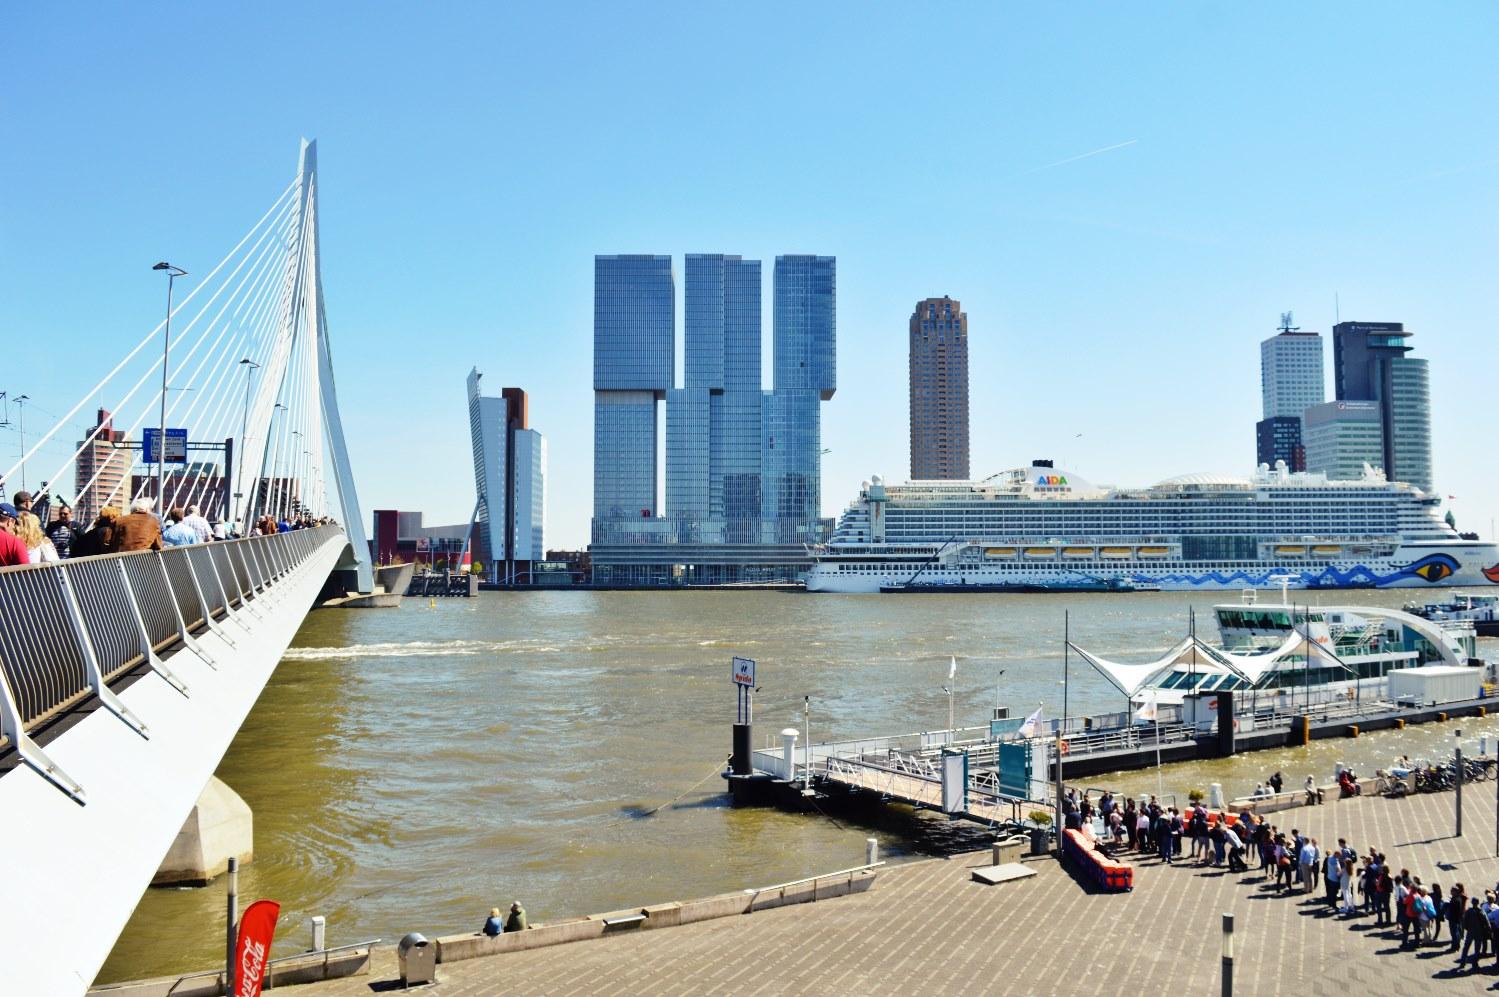 The Rotterdam Harbor